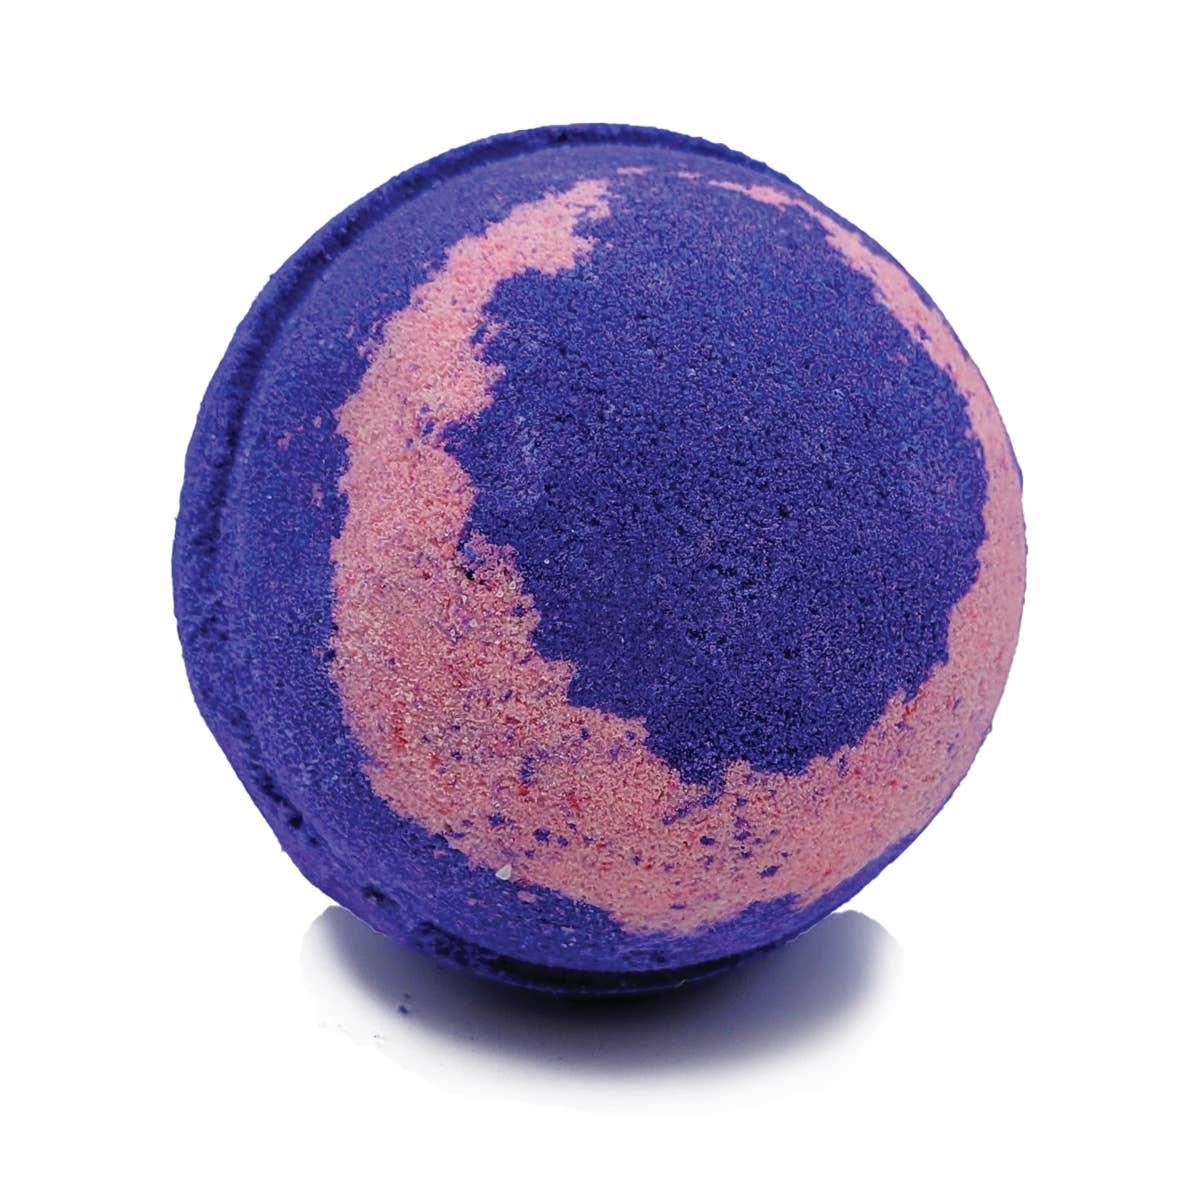 Evolve - Bath Bomb - Chakra Collection - Amethyst | Trada Marketplace